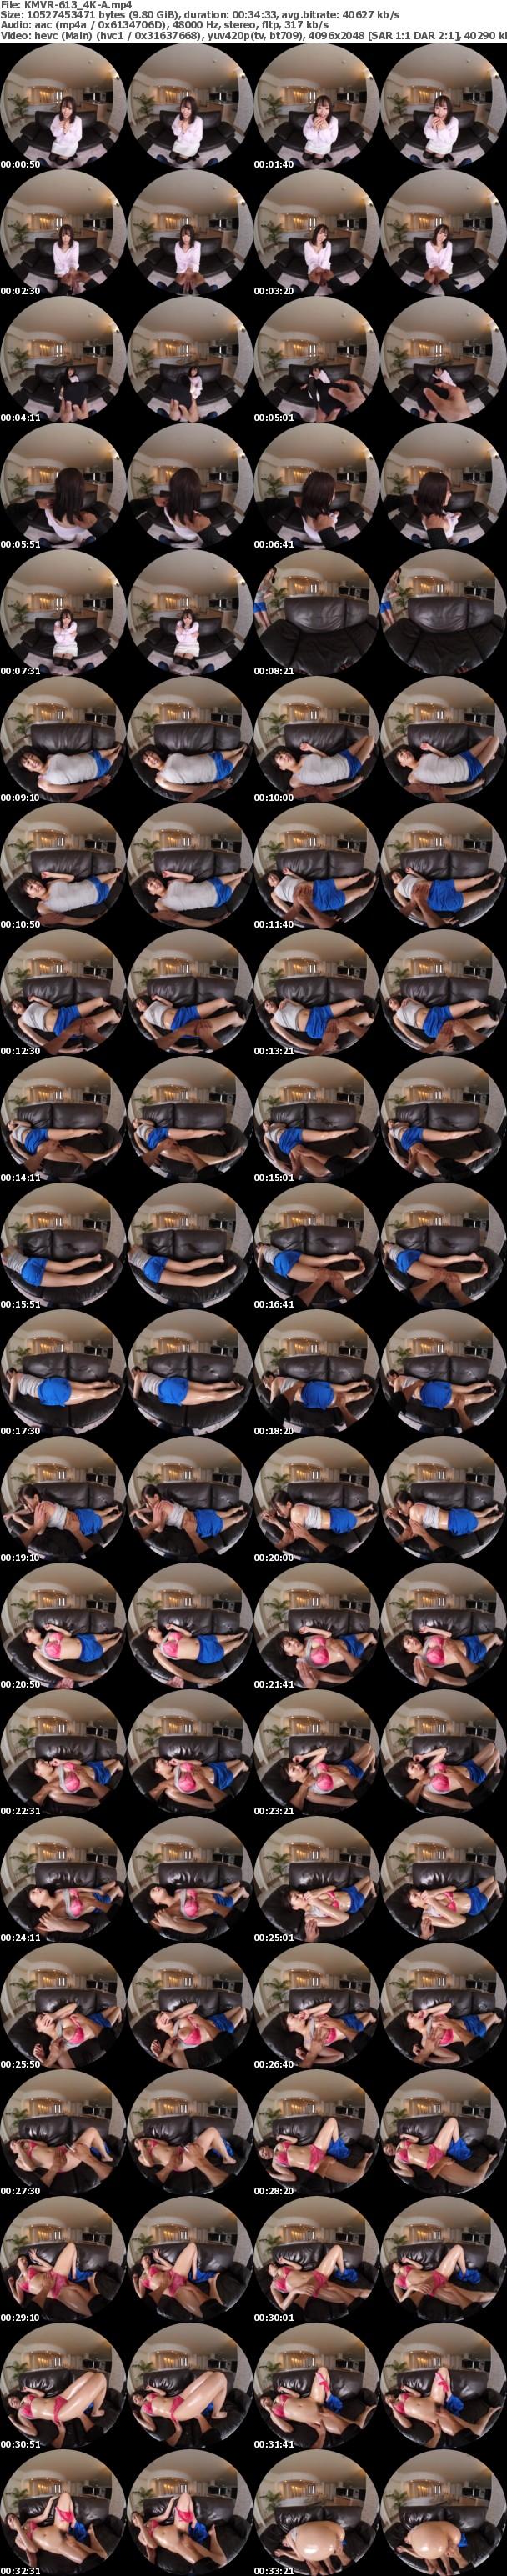 (VR) (4K) KVR1904-40 (KMVR-613) 【4K匠】【悲報】「悪徳出張ホスト体験!」のはずが、媚薬入りオイルでイキまくりの潮吹き中出しセックスになり、結果… 浜崎真緒